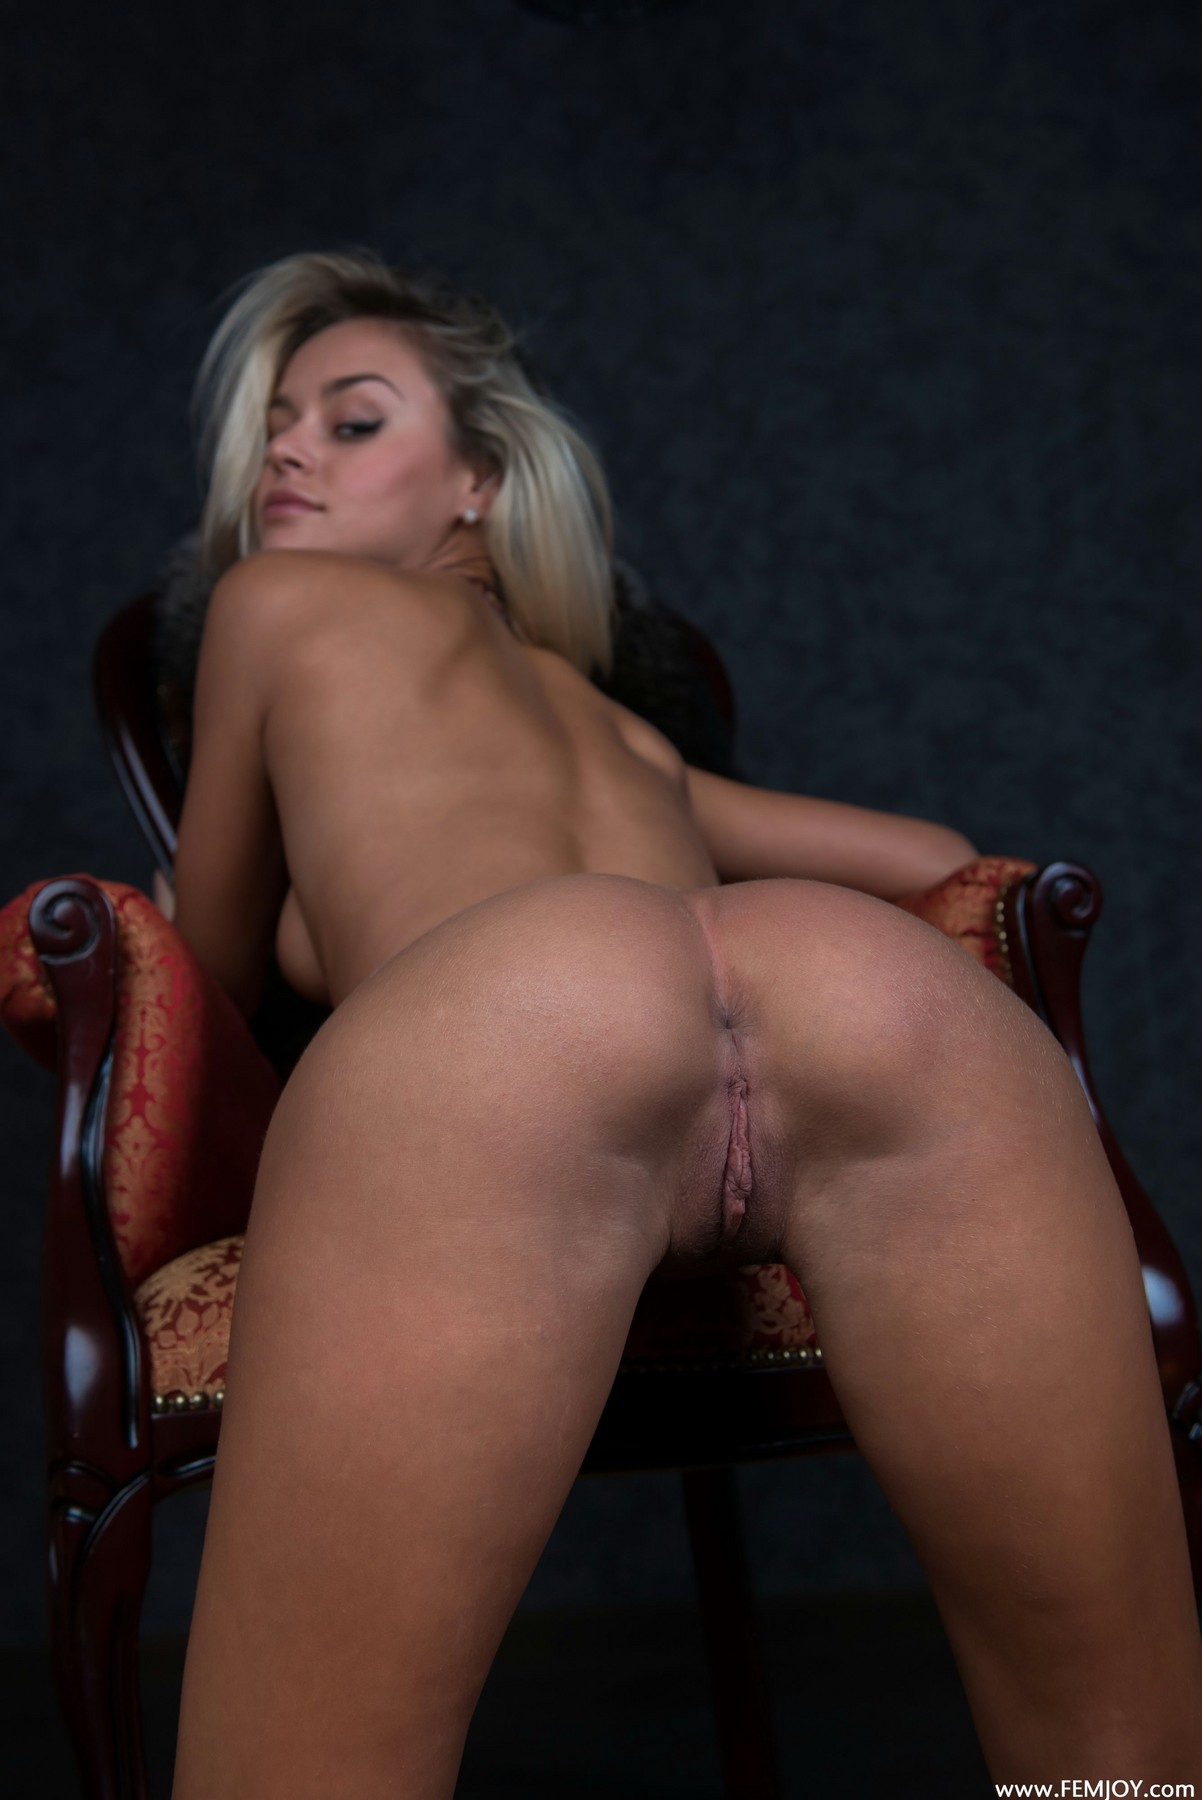 nonna-armchair-femjoy-11